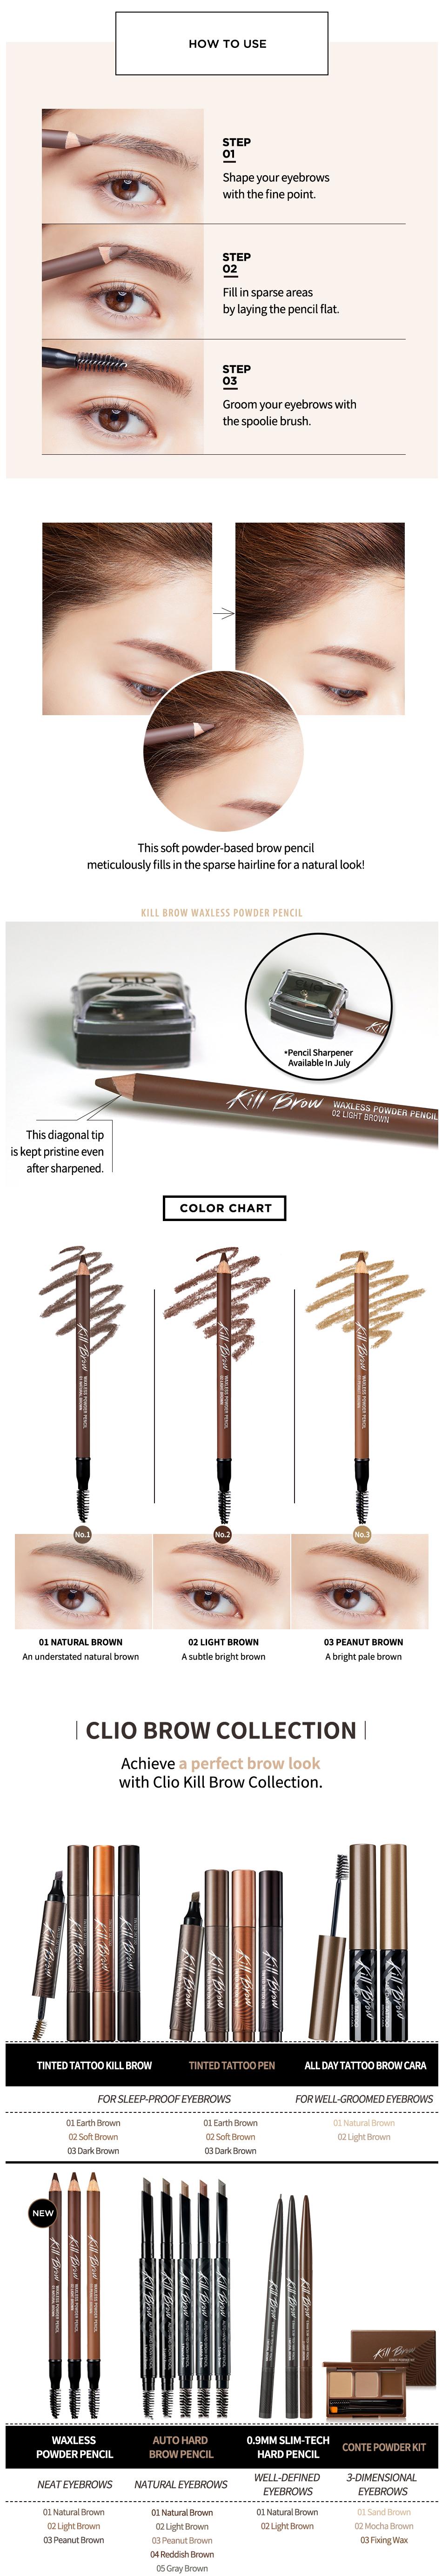 clio-kill-brow-waxless-powder-pencil2.jpg